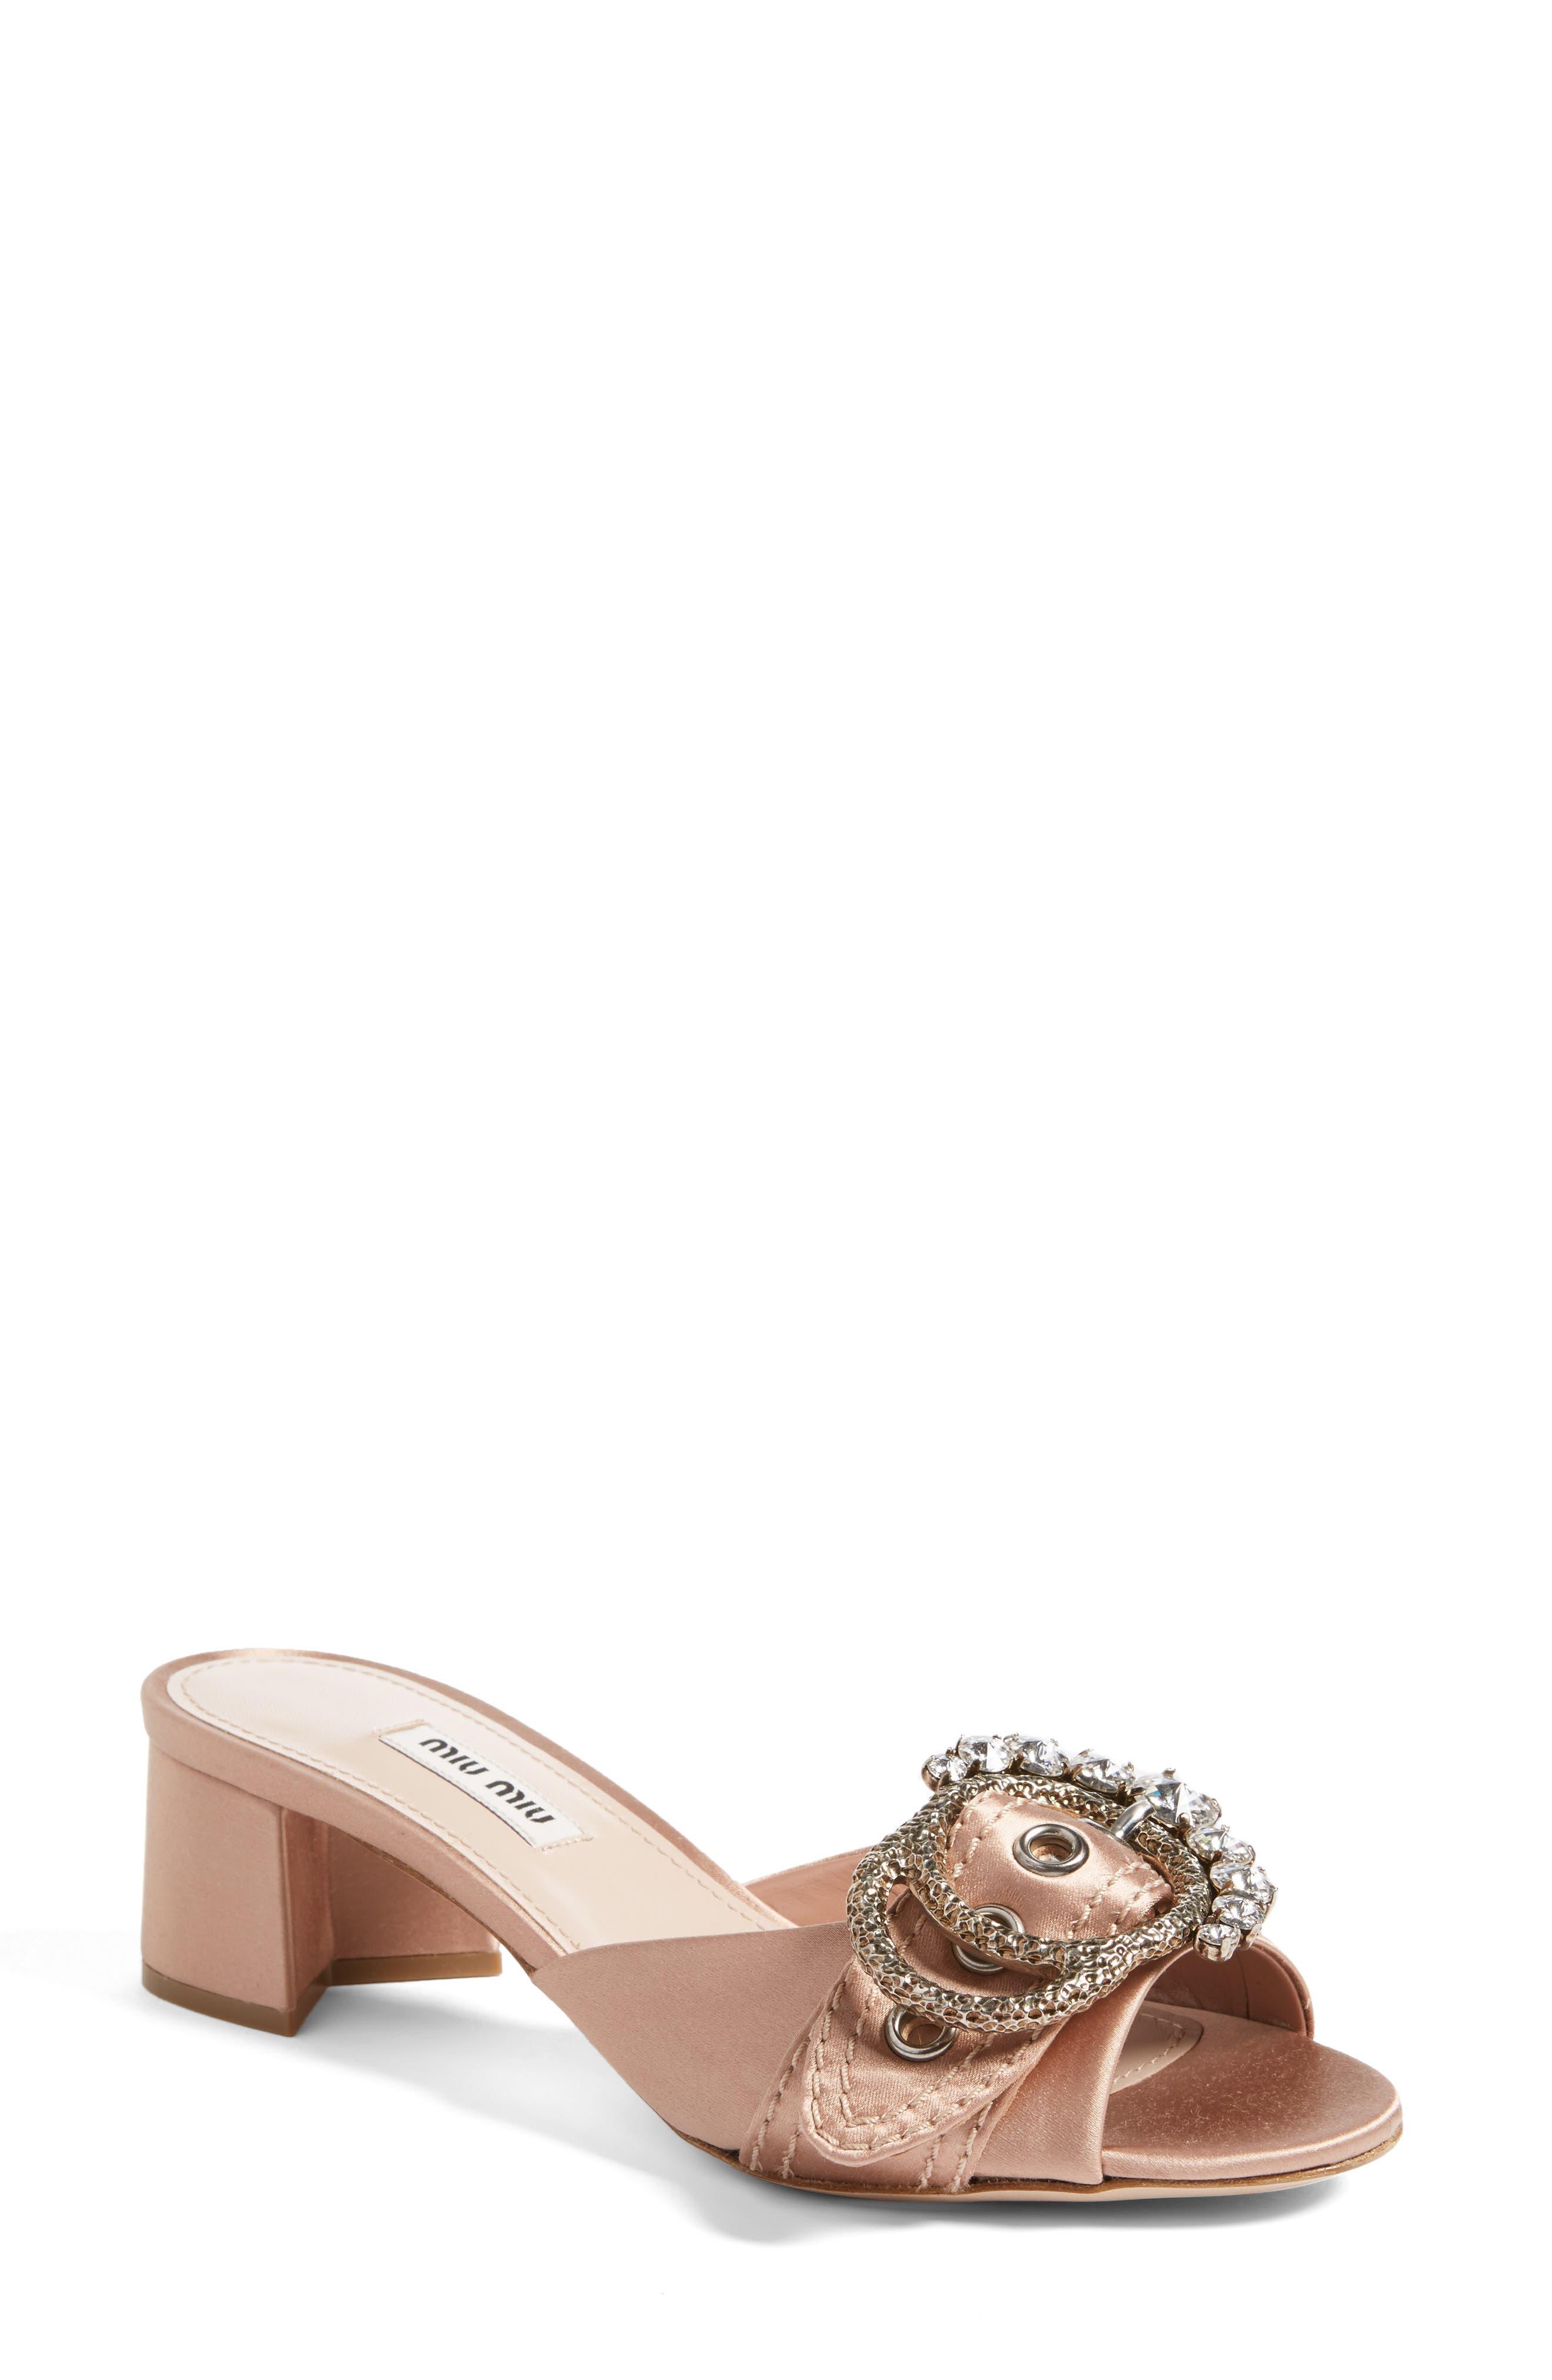 Miu Miu Jewel Buckle Sandal (Women)